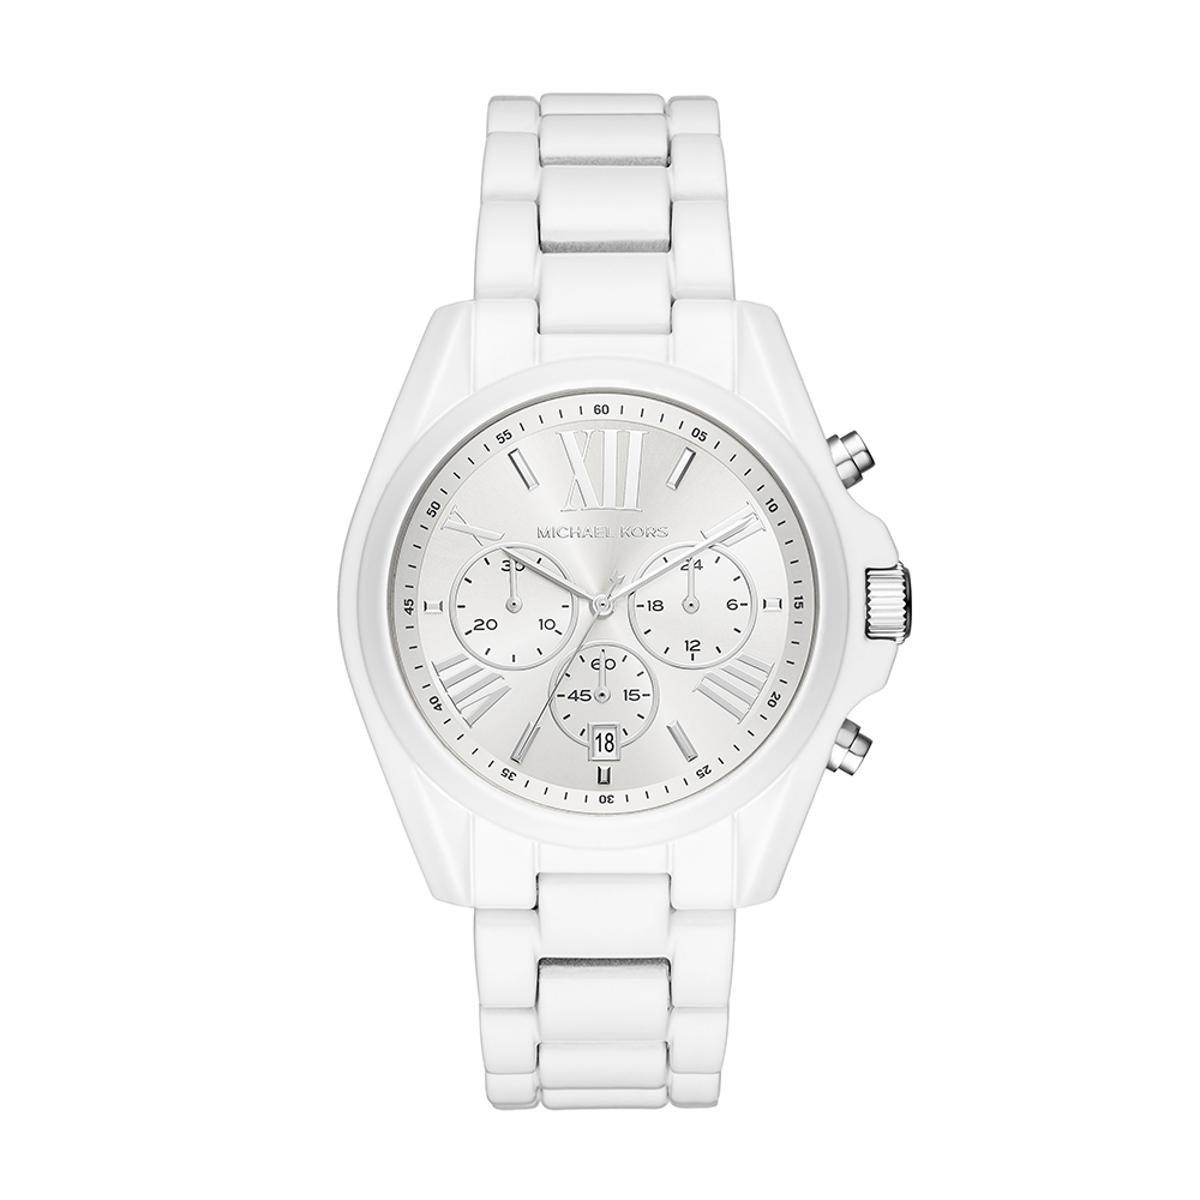 c0f79fb54954d Relógio Michael Kors Feminino Bradshaw - MK6585 1BN MK6585 1BN ...